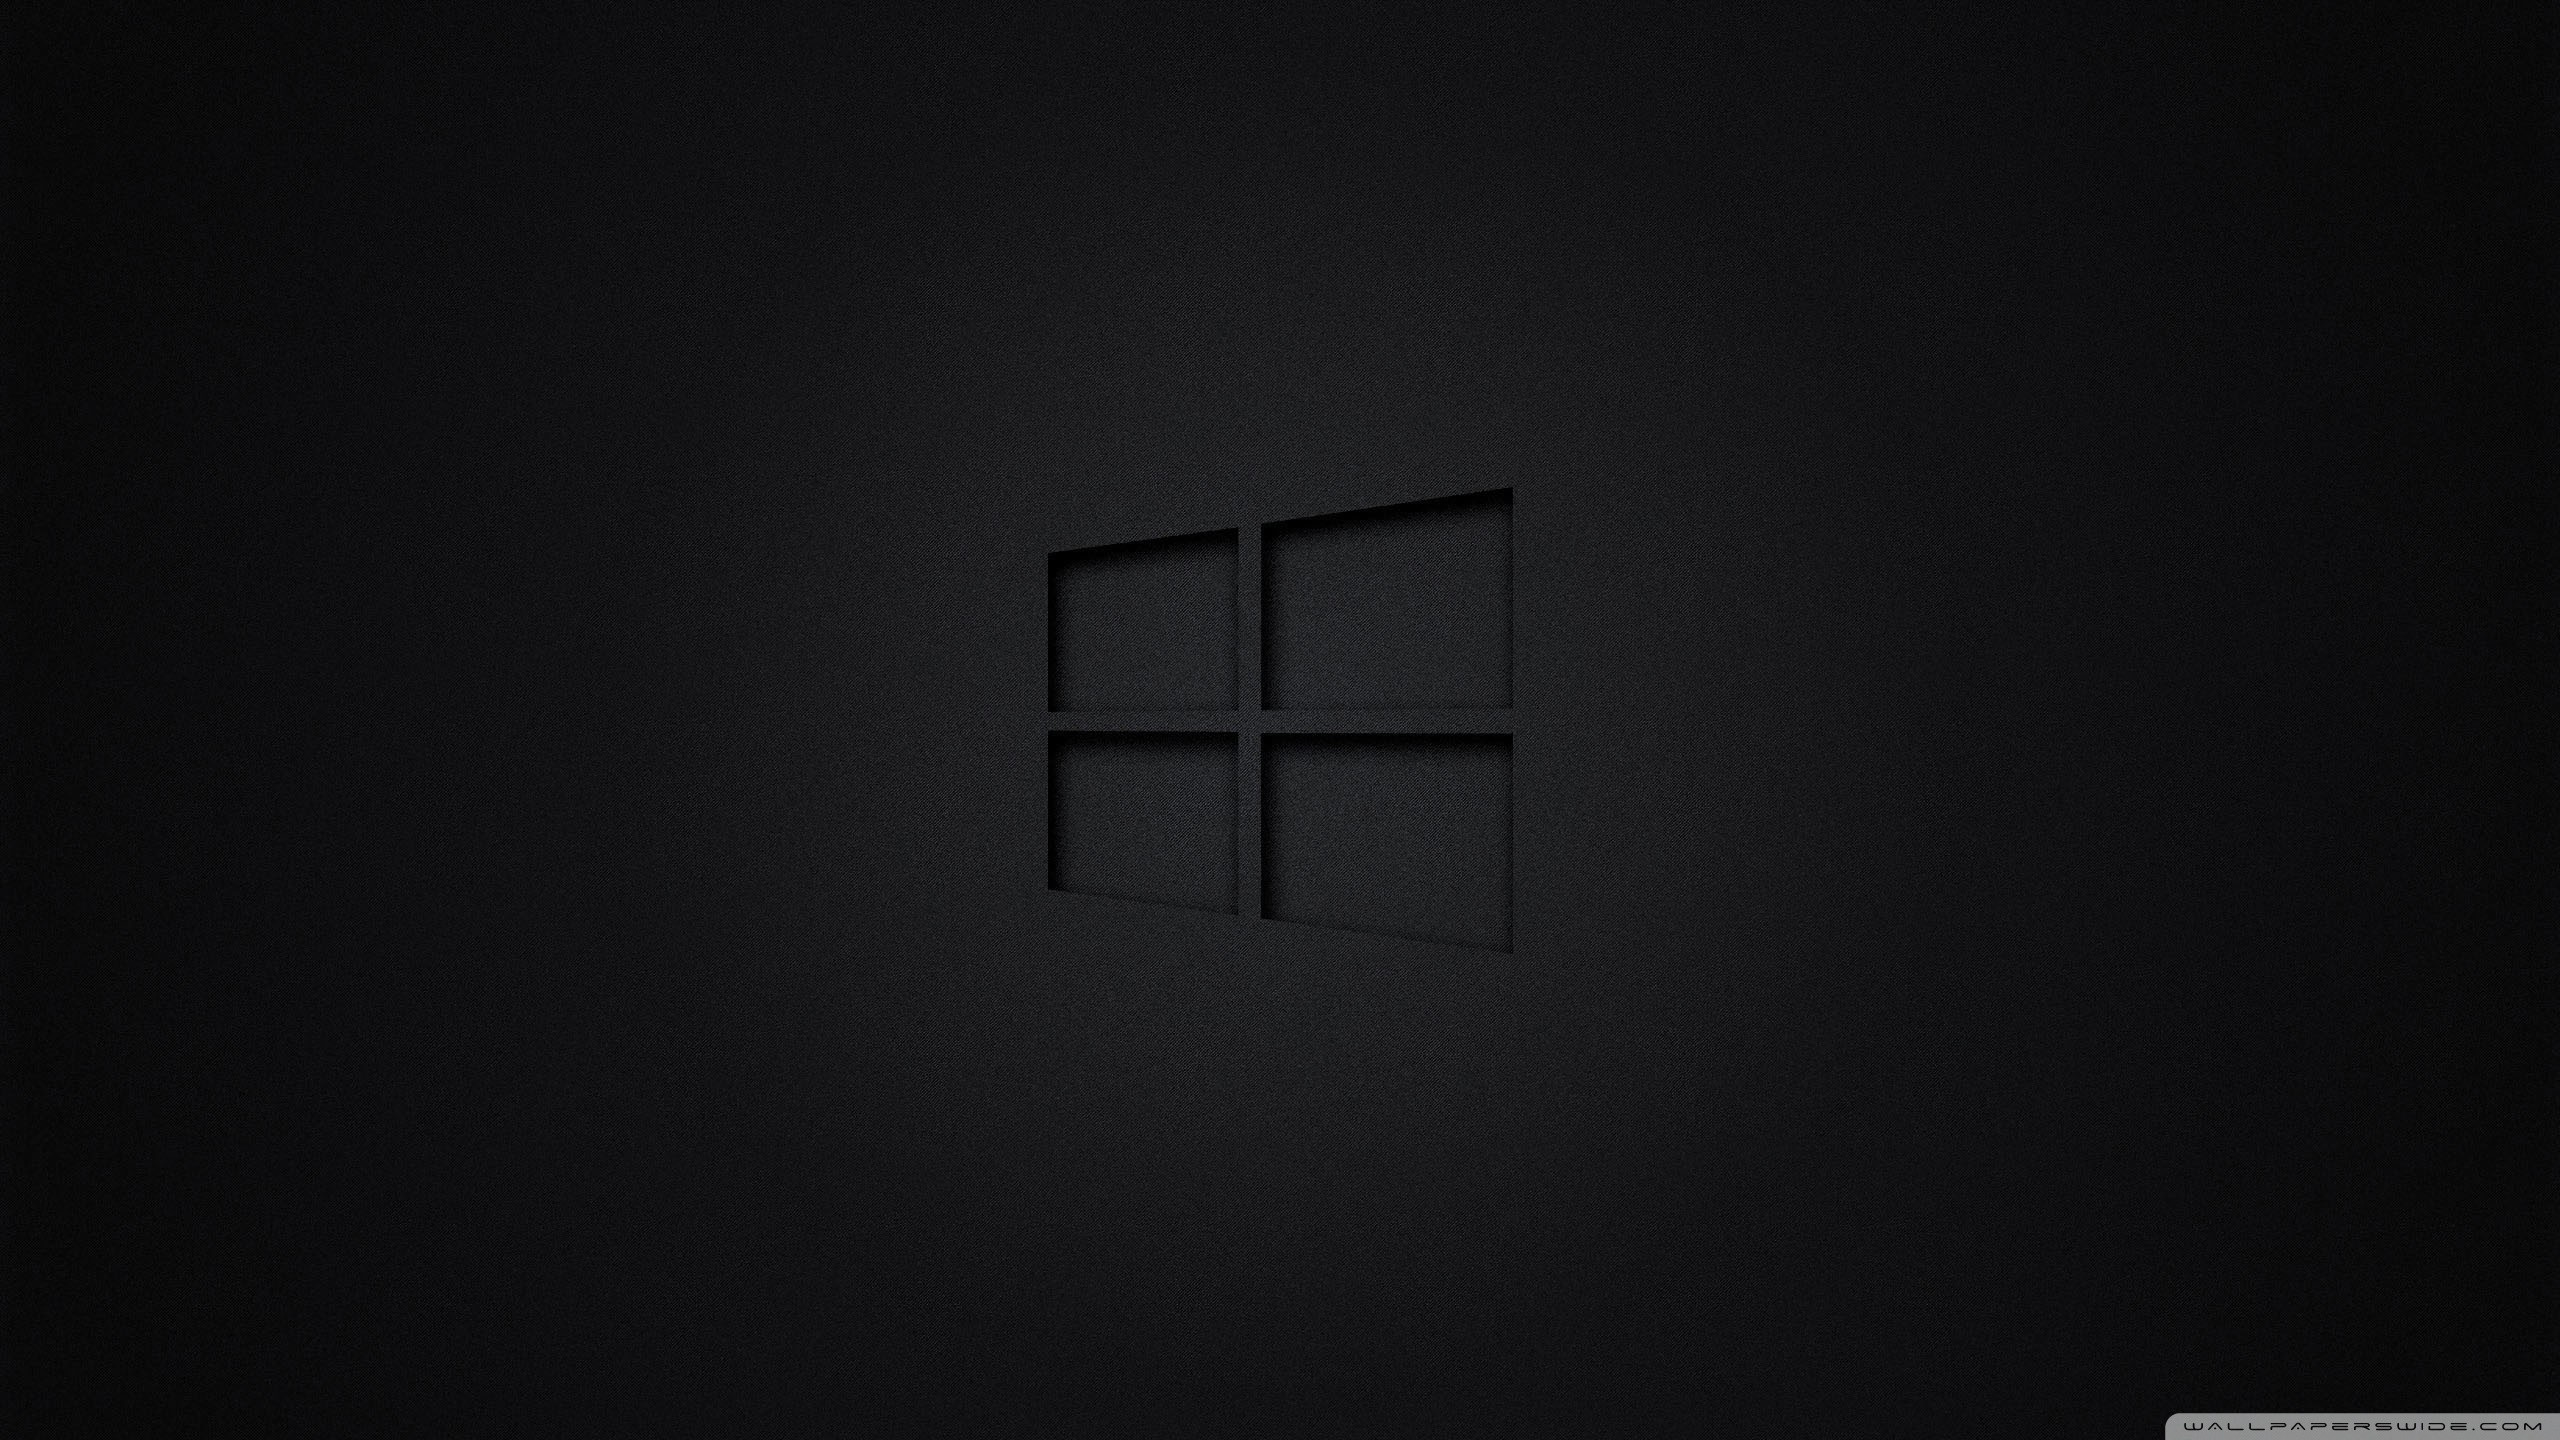 Windows 10 Dark Wallpaper 70 Images